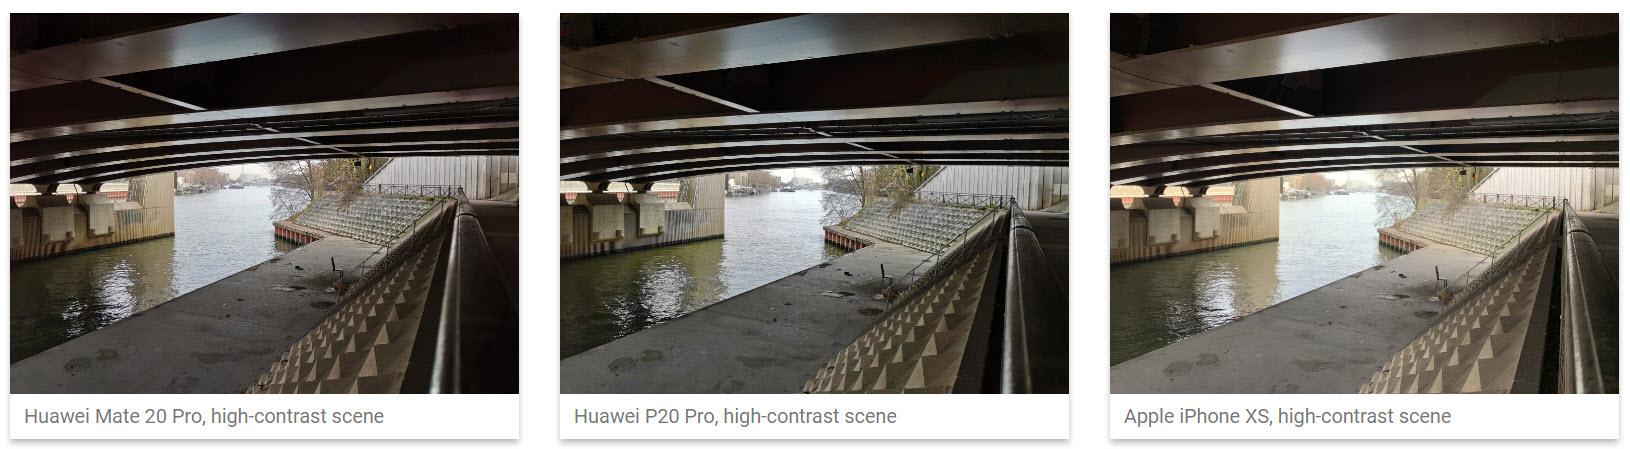 Dxomark Huawei Mate 20 Pro Camera Img 3